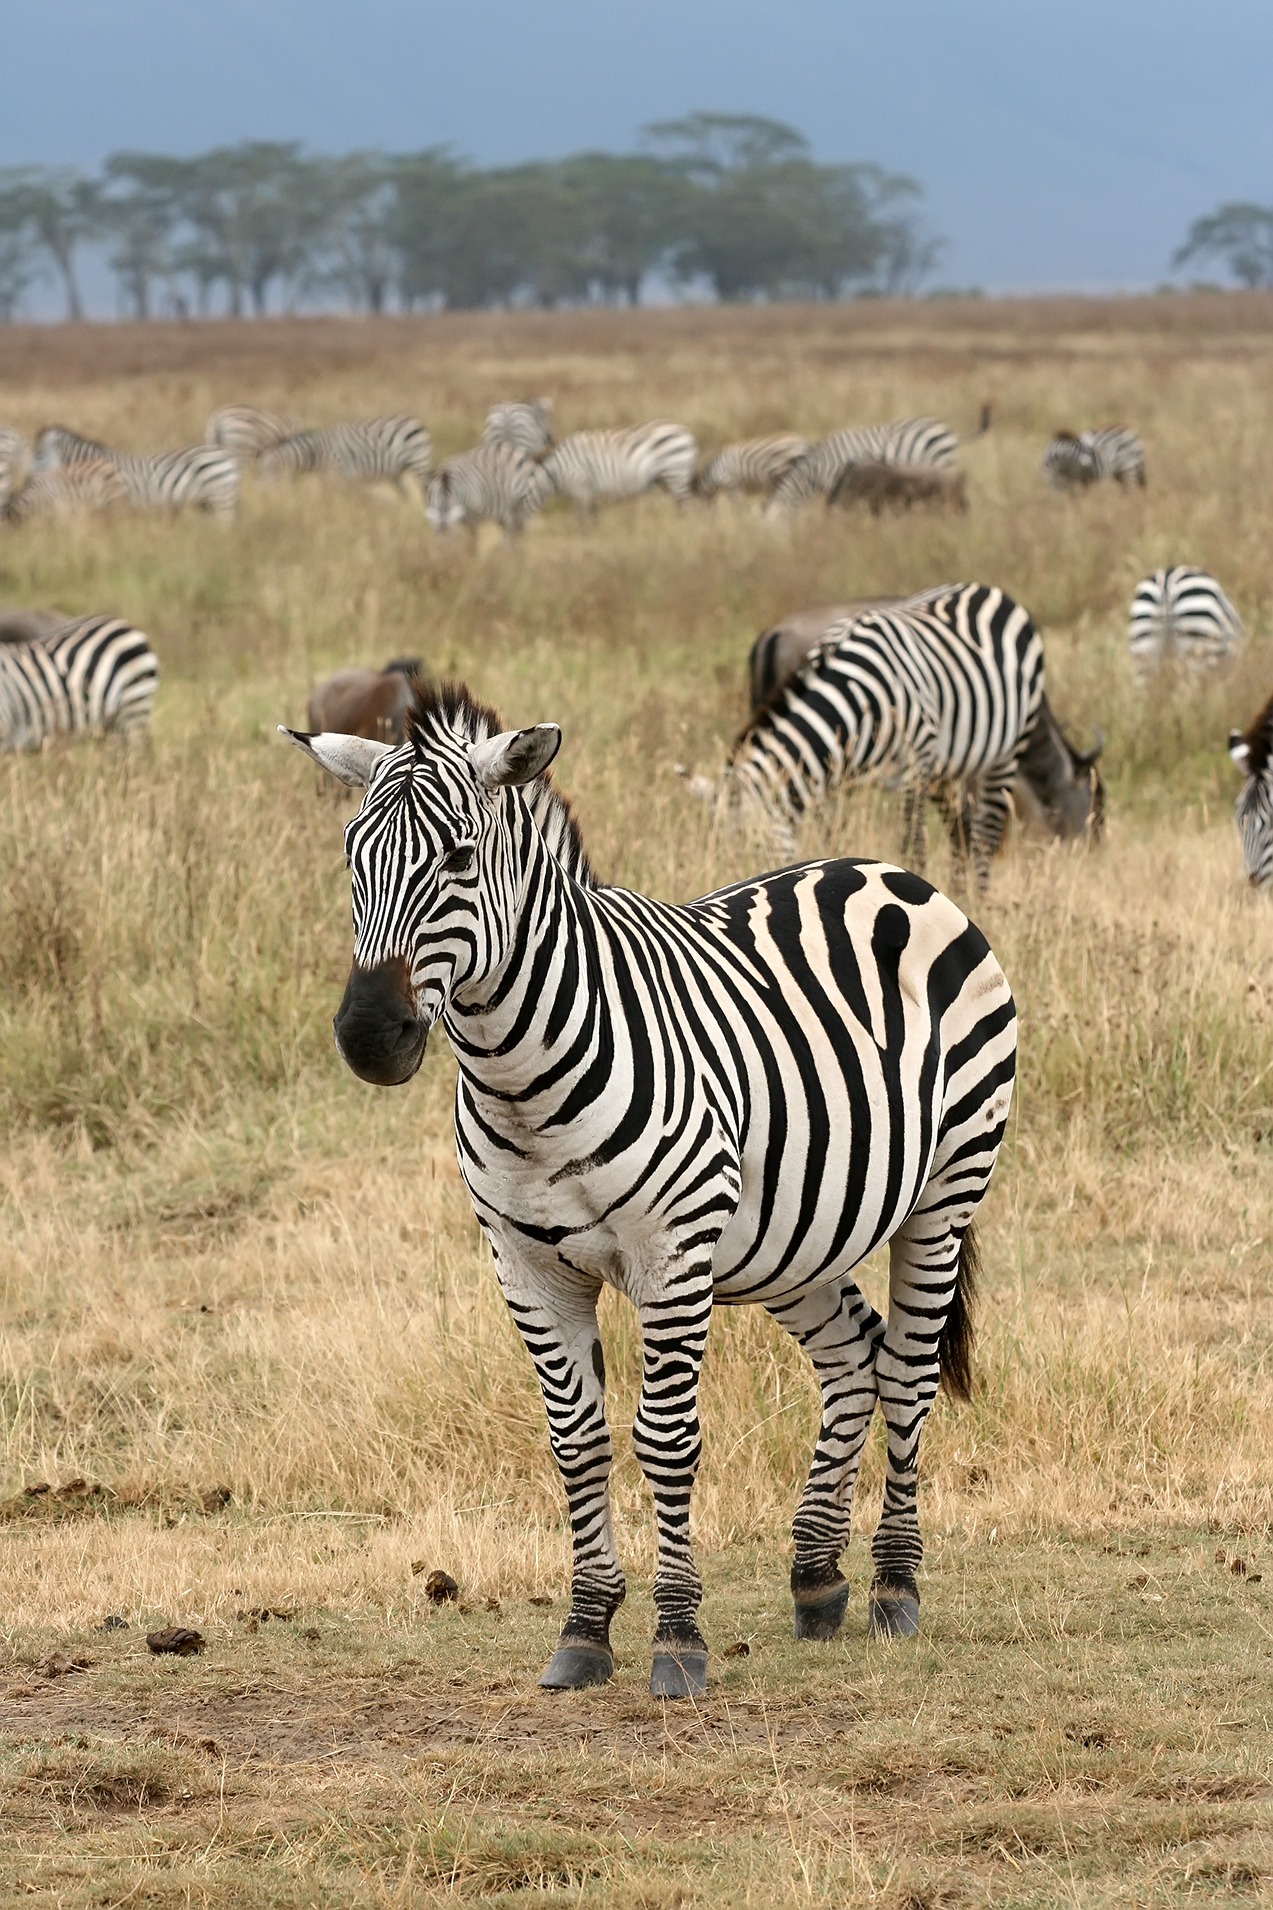 Zebra - Wikipedia